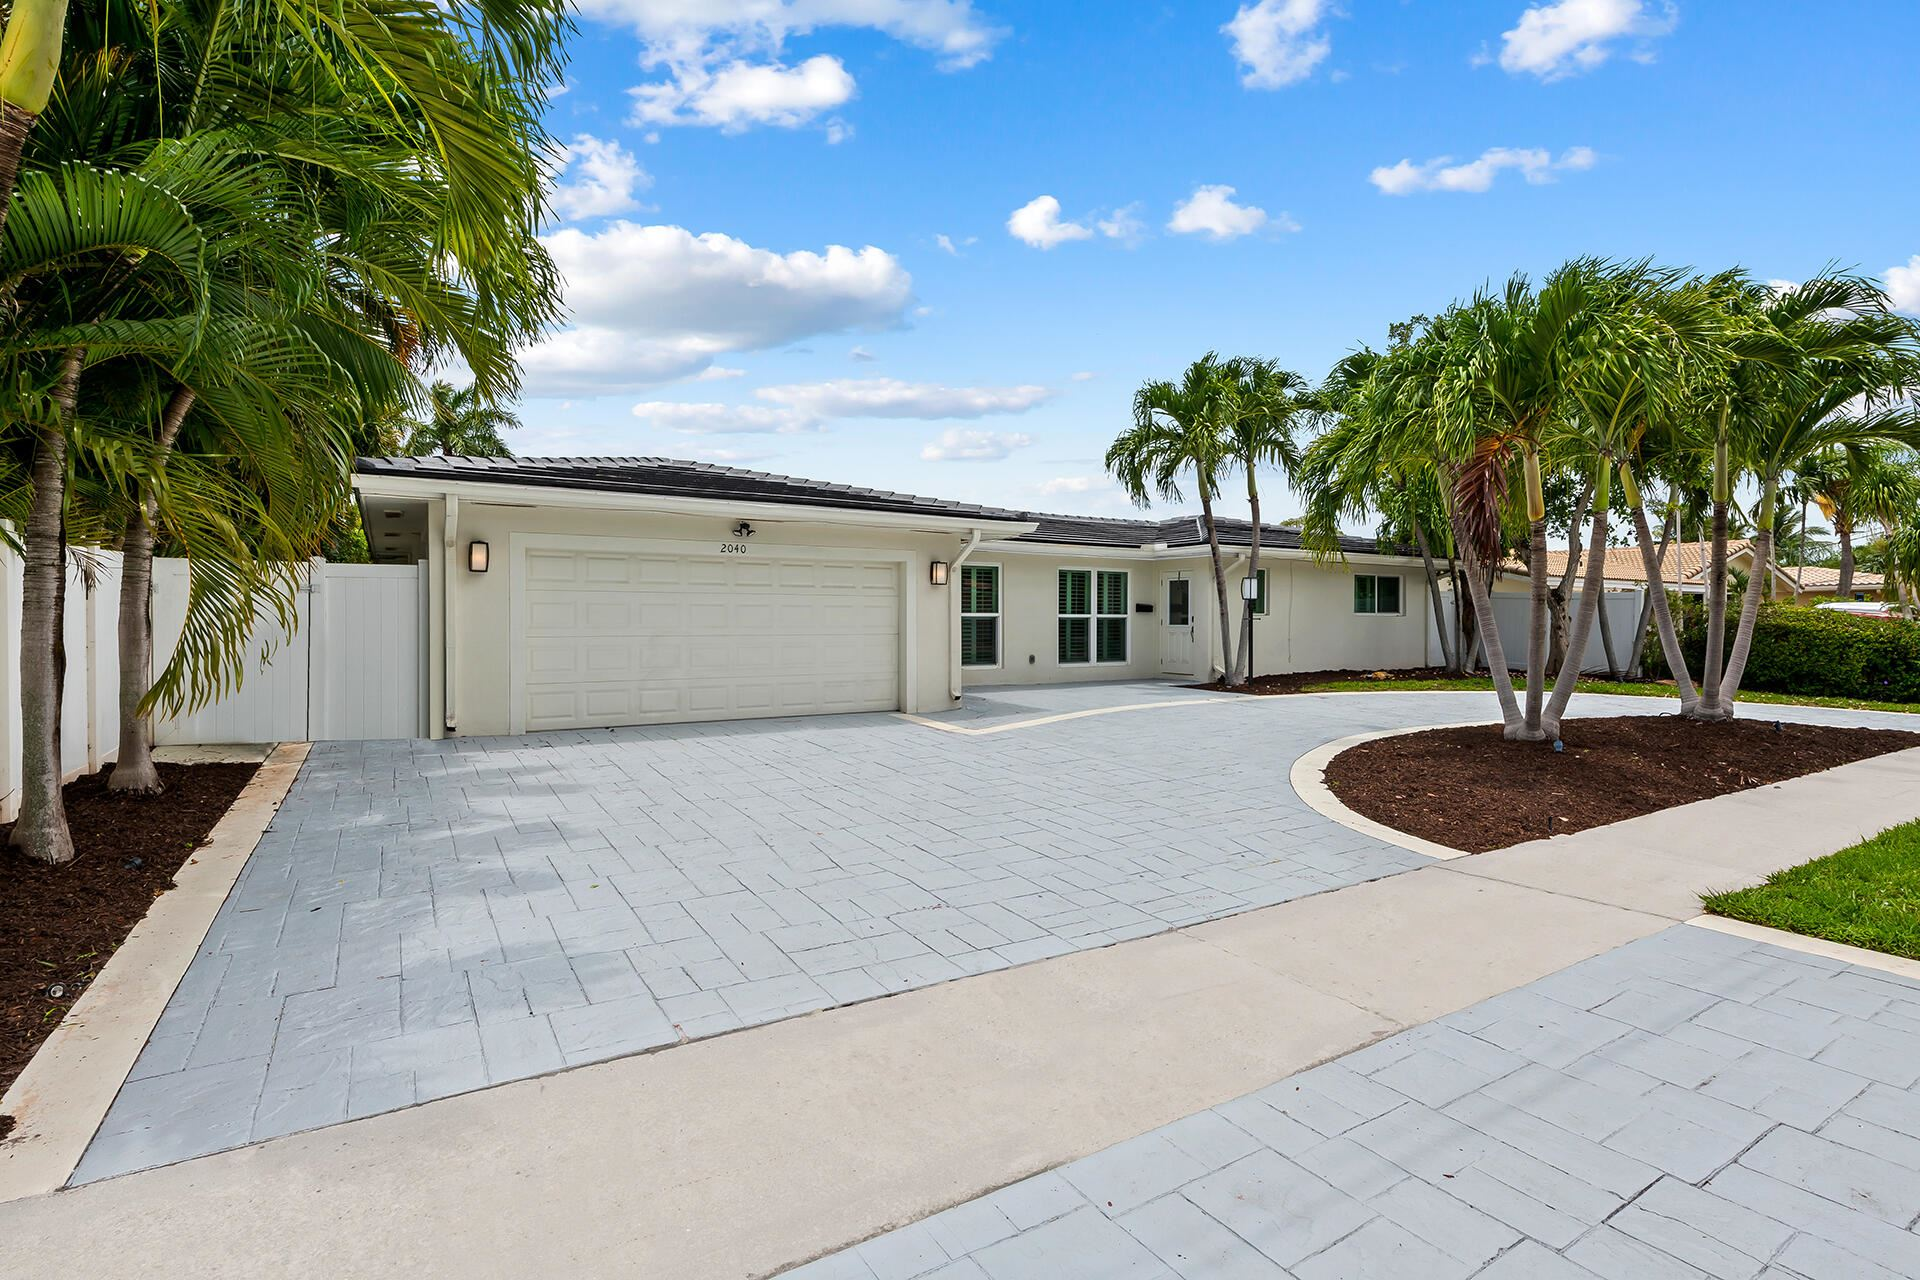 Photo of 2040 NE 65 Street, Fort Lauderdale, FL 33308 (MLS # RX-10729831)